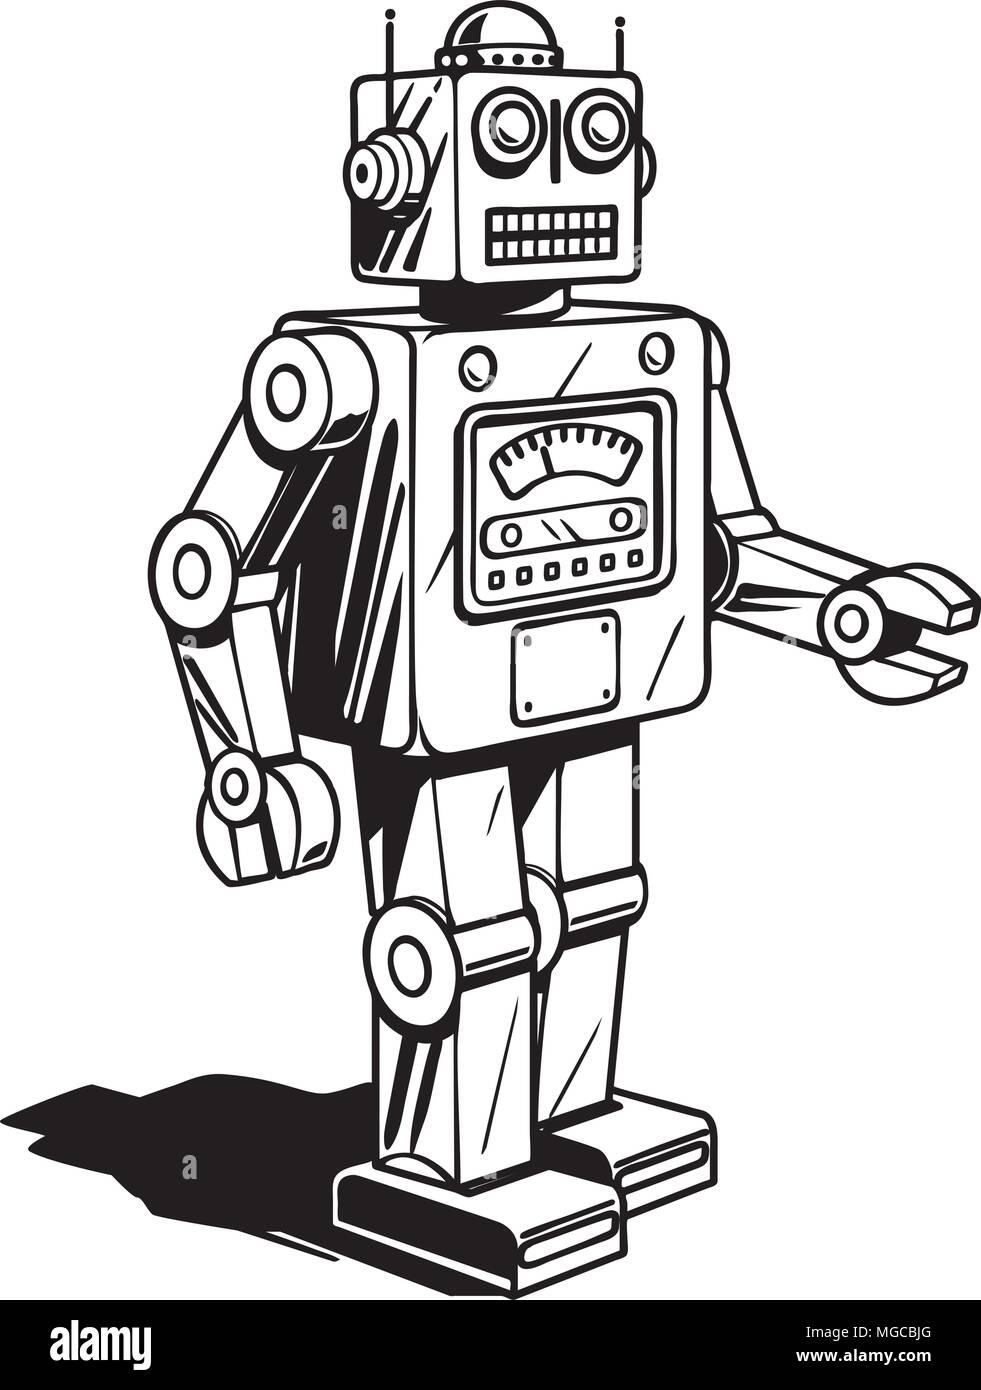 hight resolution of retro robot retro clipart illustration